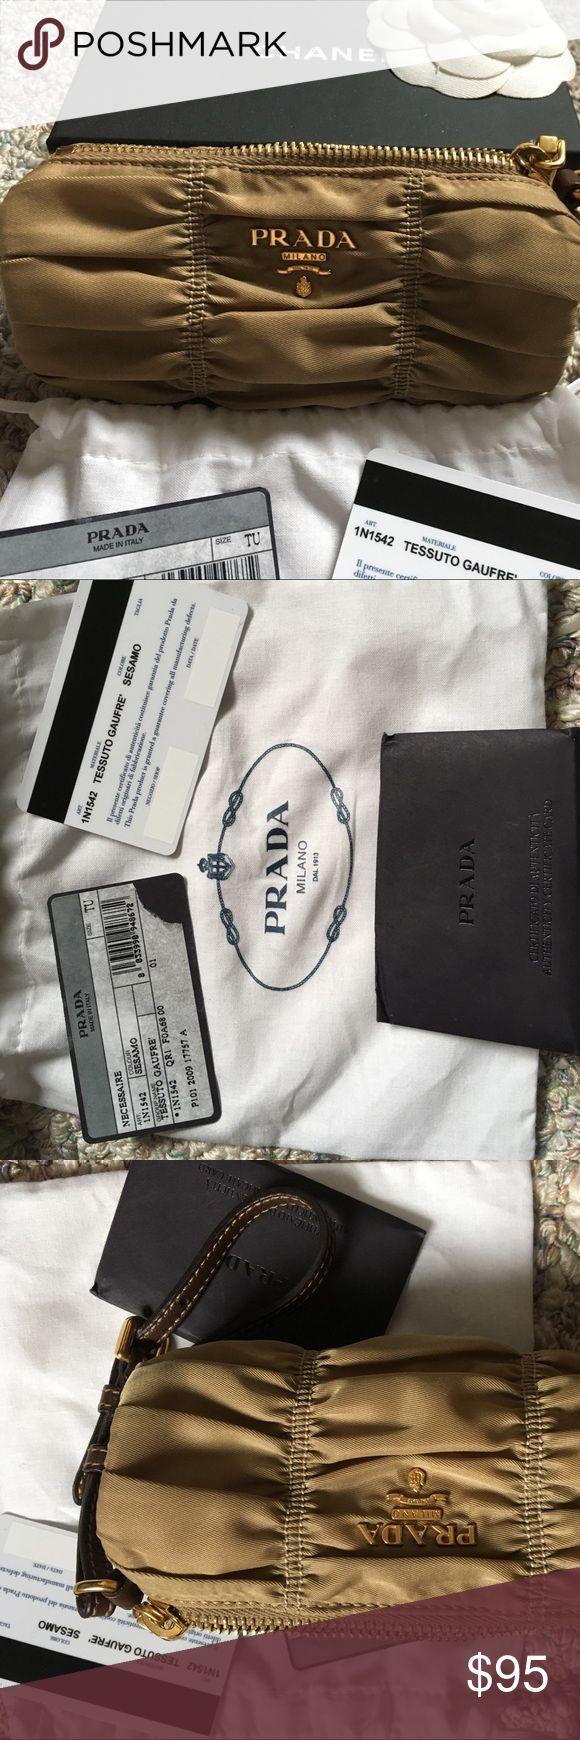 "PRADA Tessuto Gaufre Wrislet Tessuto Nylon Dark Beige Sesamo  In like new condition  Includes Prada Authenticity Cards and Dust Cover  6""x3"" x3"" Prada Bags Clutches & Wristlets"